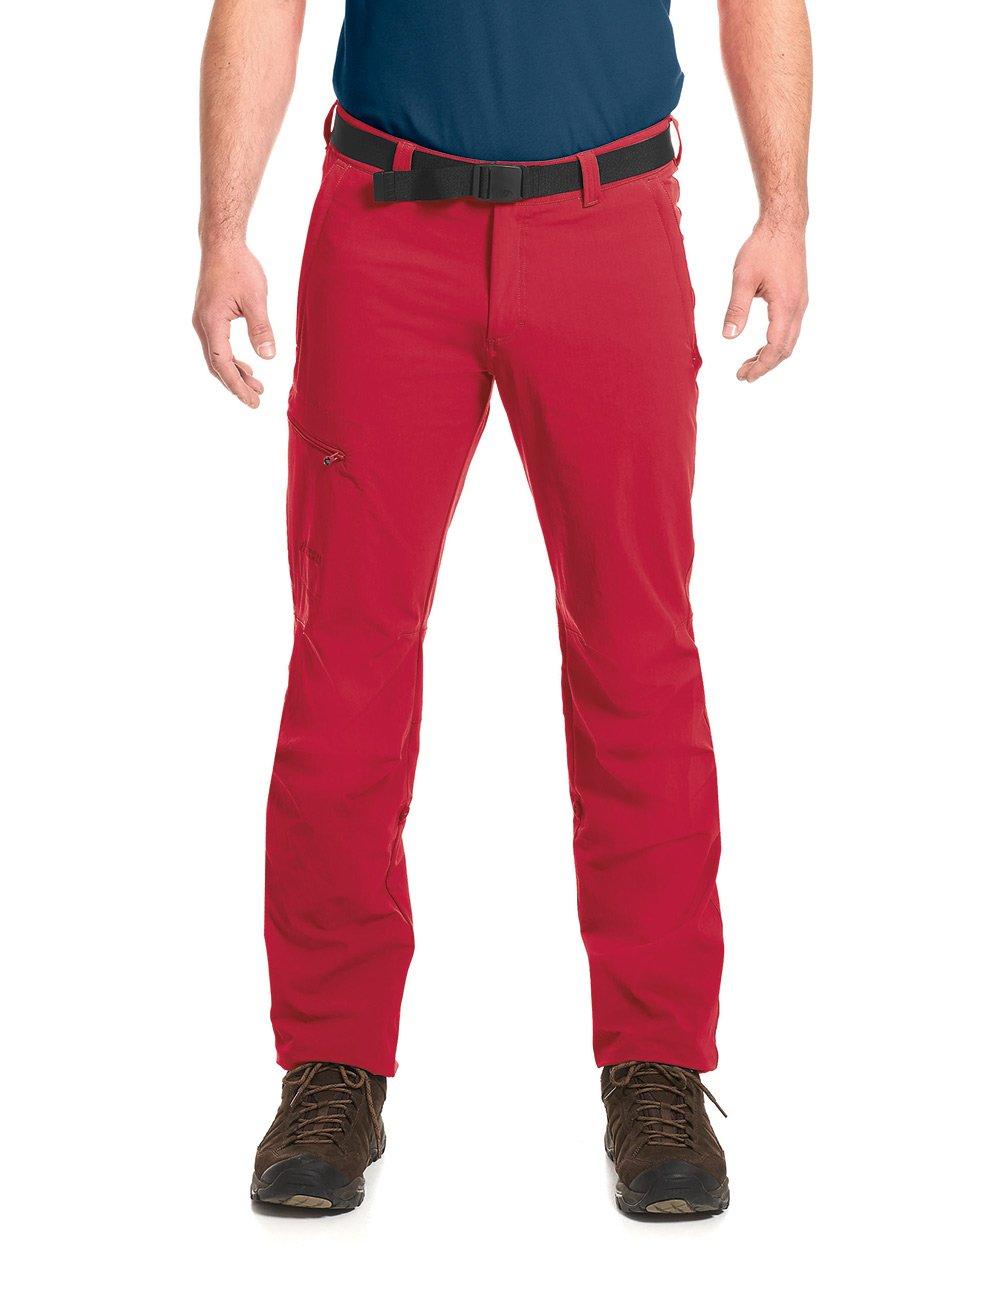 Salsa 122 cm maier sports Nil Pantalon de randonnée